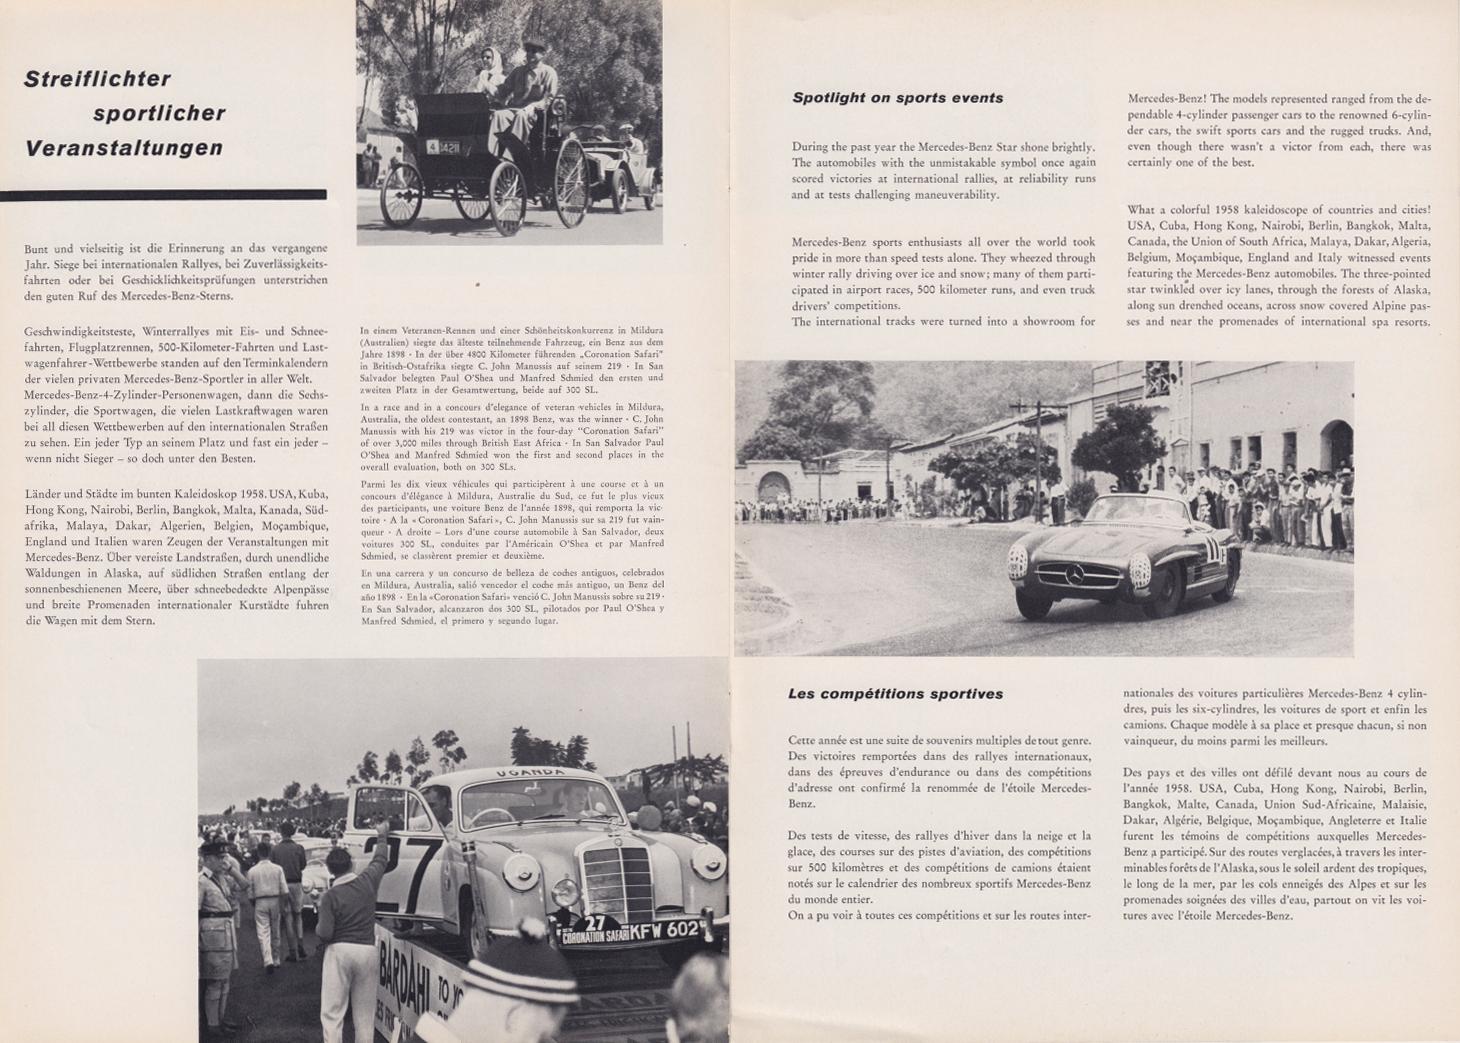 (REVISTA): Periódico In aller welt n.º 29 - Mercedes-Benz no mundo - 1959 - multilingue 008